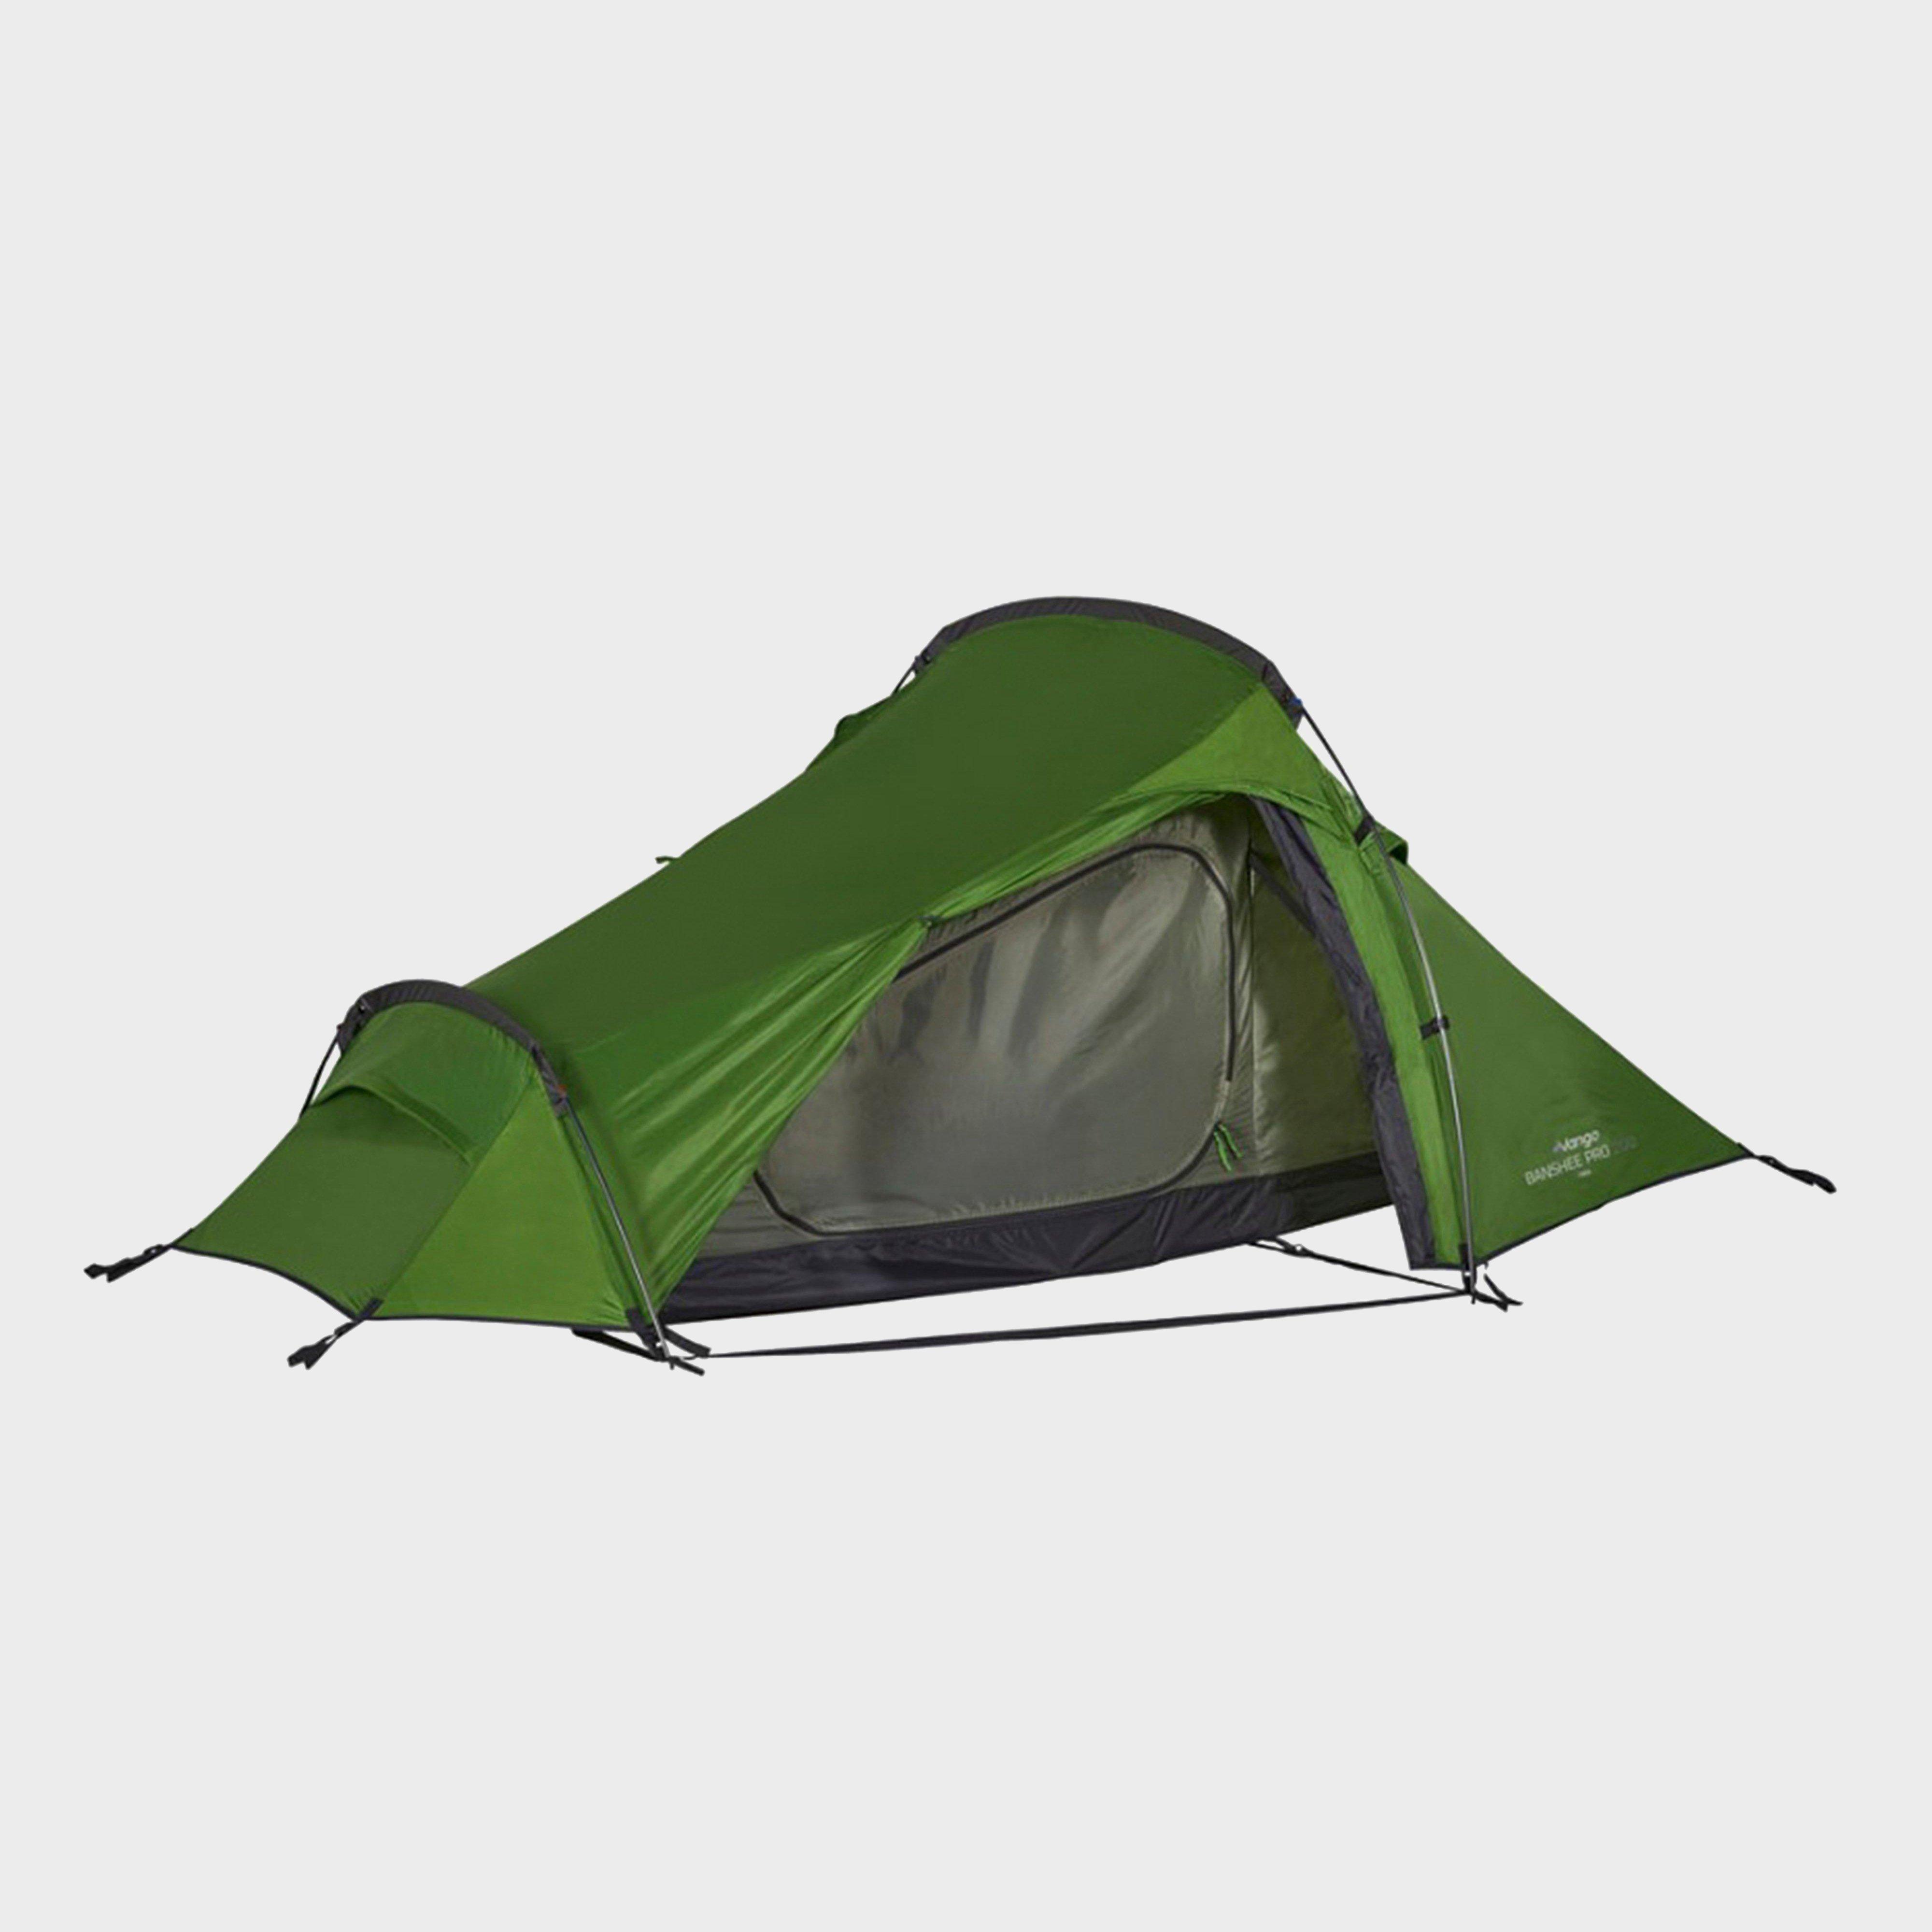 Dark Green VANGO Banshee Pro 200 & Lightweight Backpacking Tents   Travel Tents   Blacks